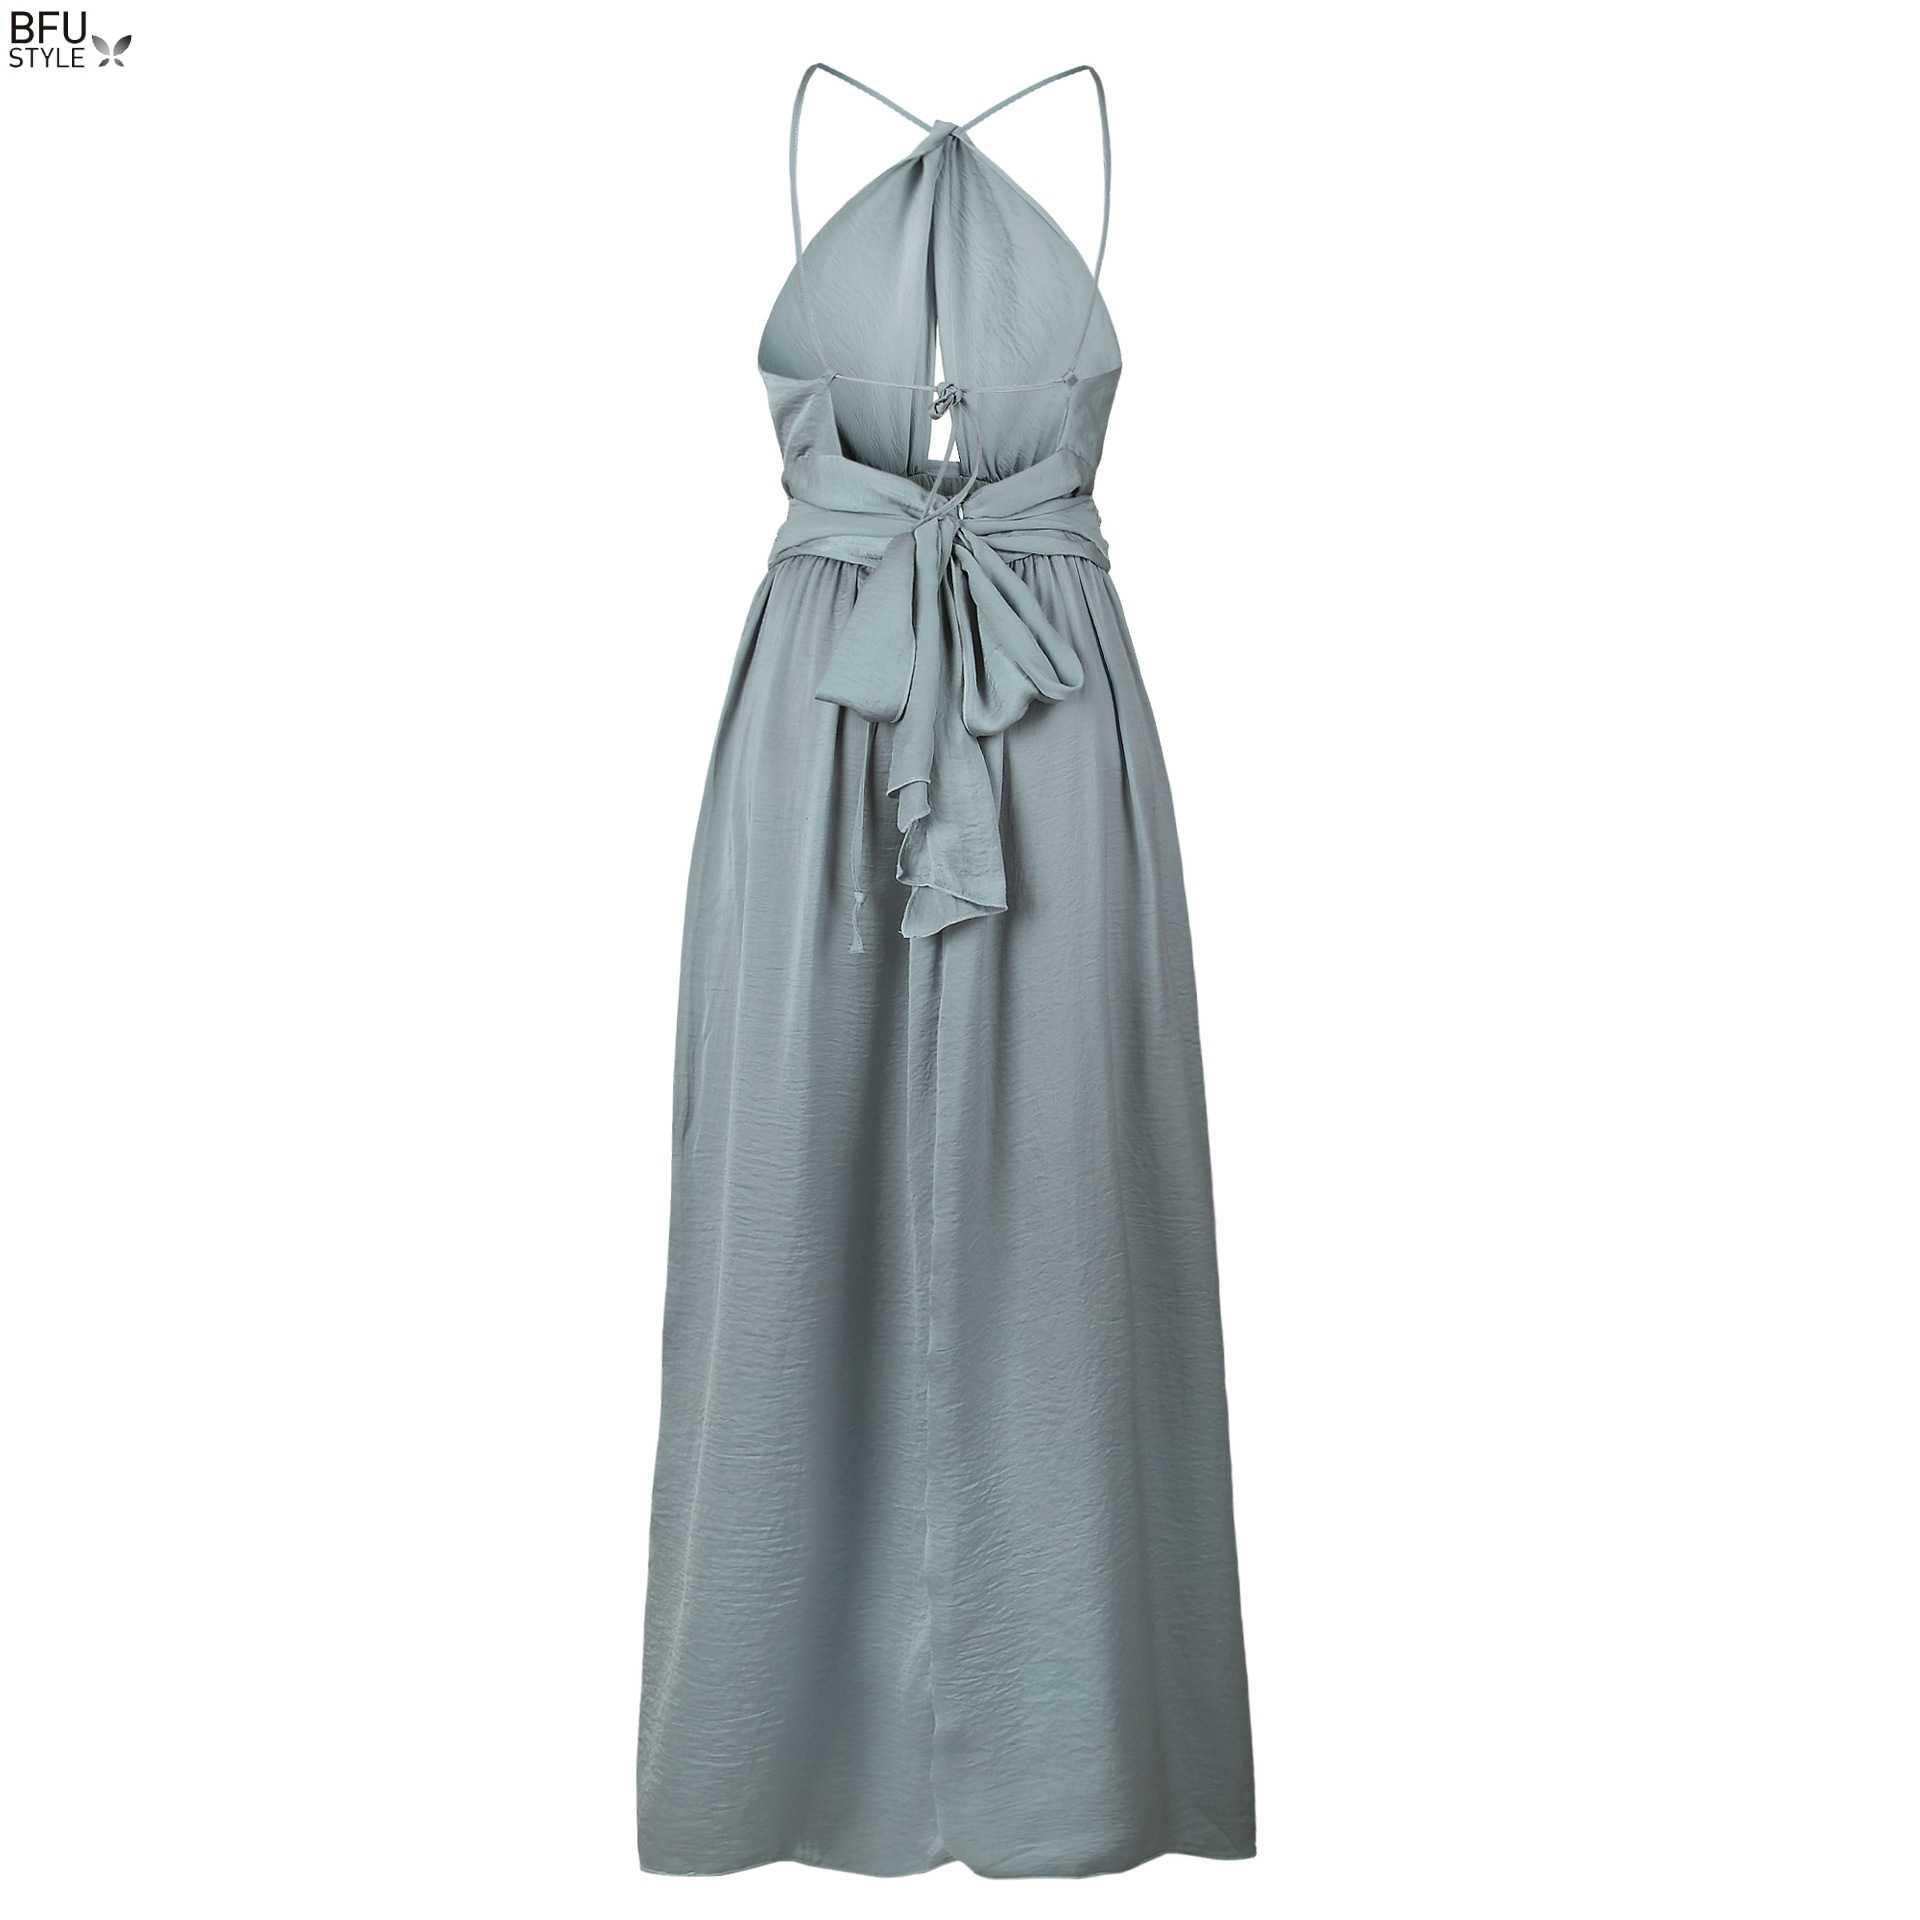 ... Sexy Maxi Dress Women Summer Backless Long Dress Elegant Halter Lace Up  Boho Wedding Party Dresses ... 44f74e2ecd84